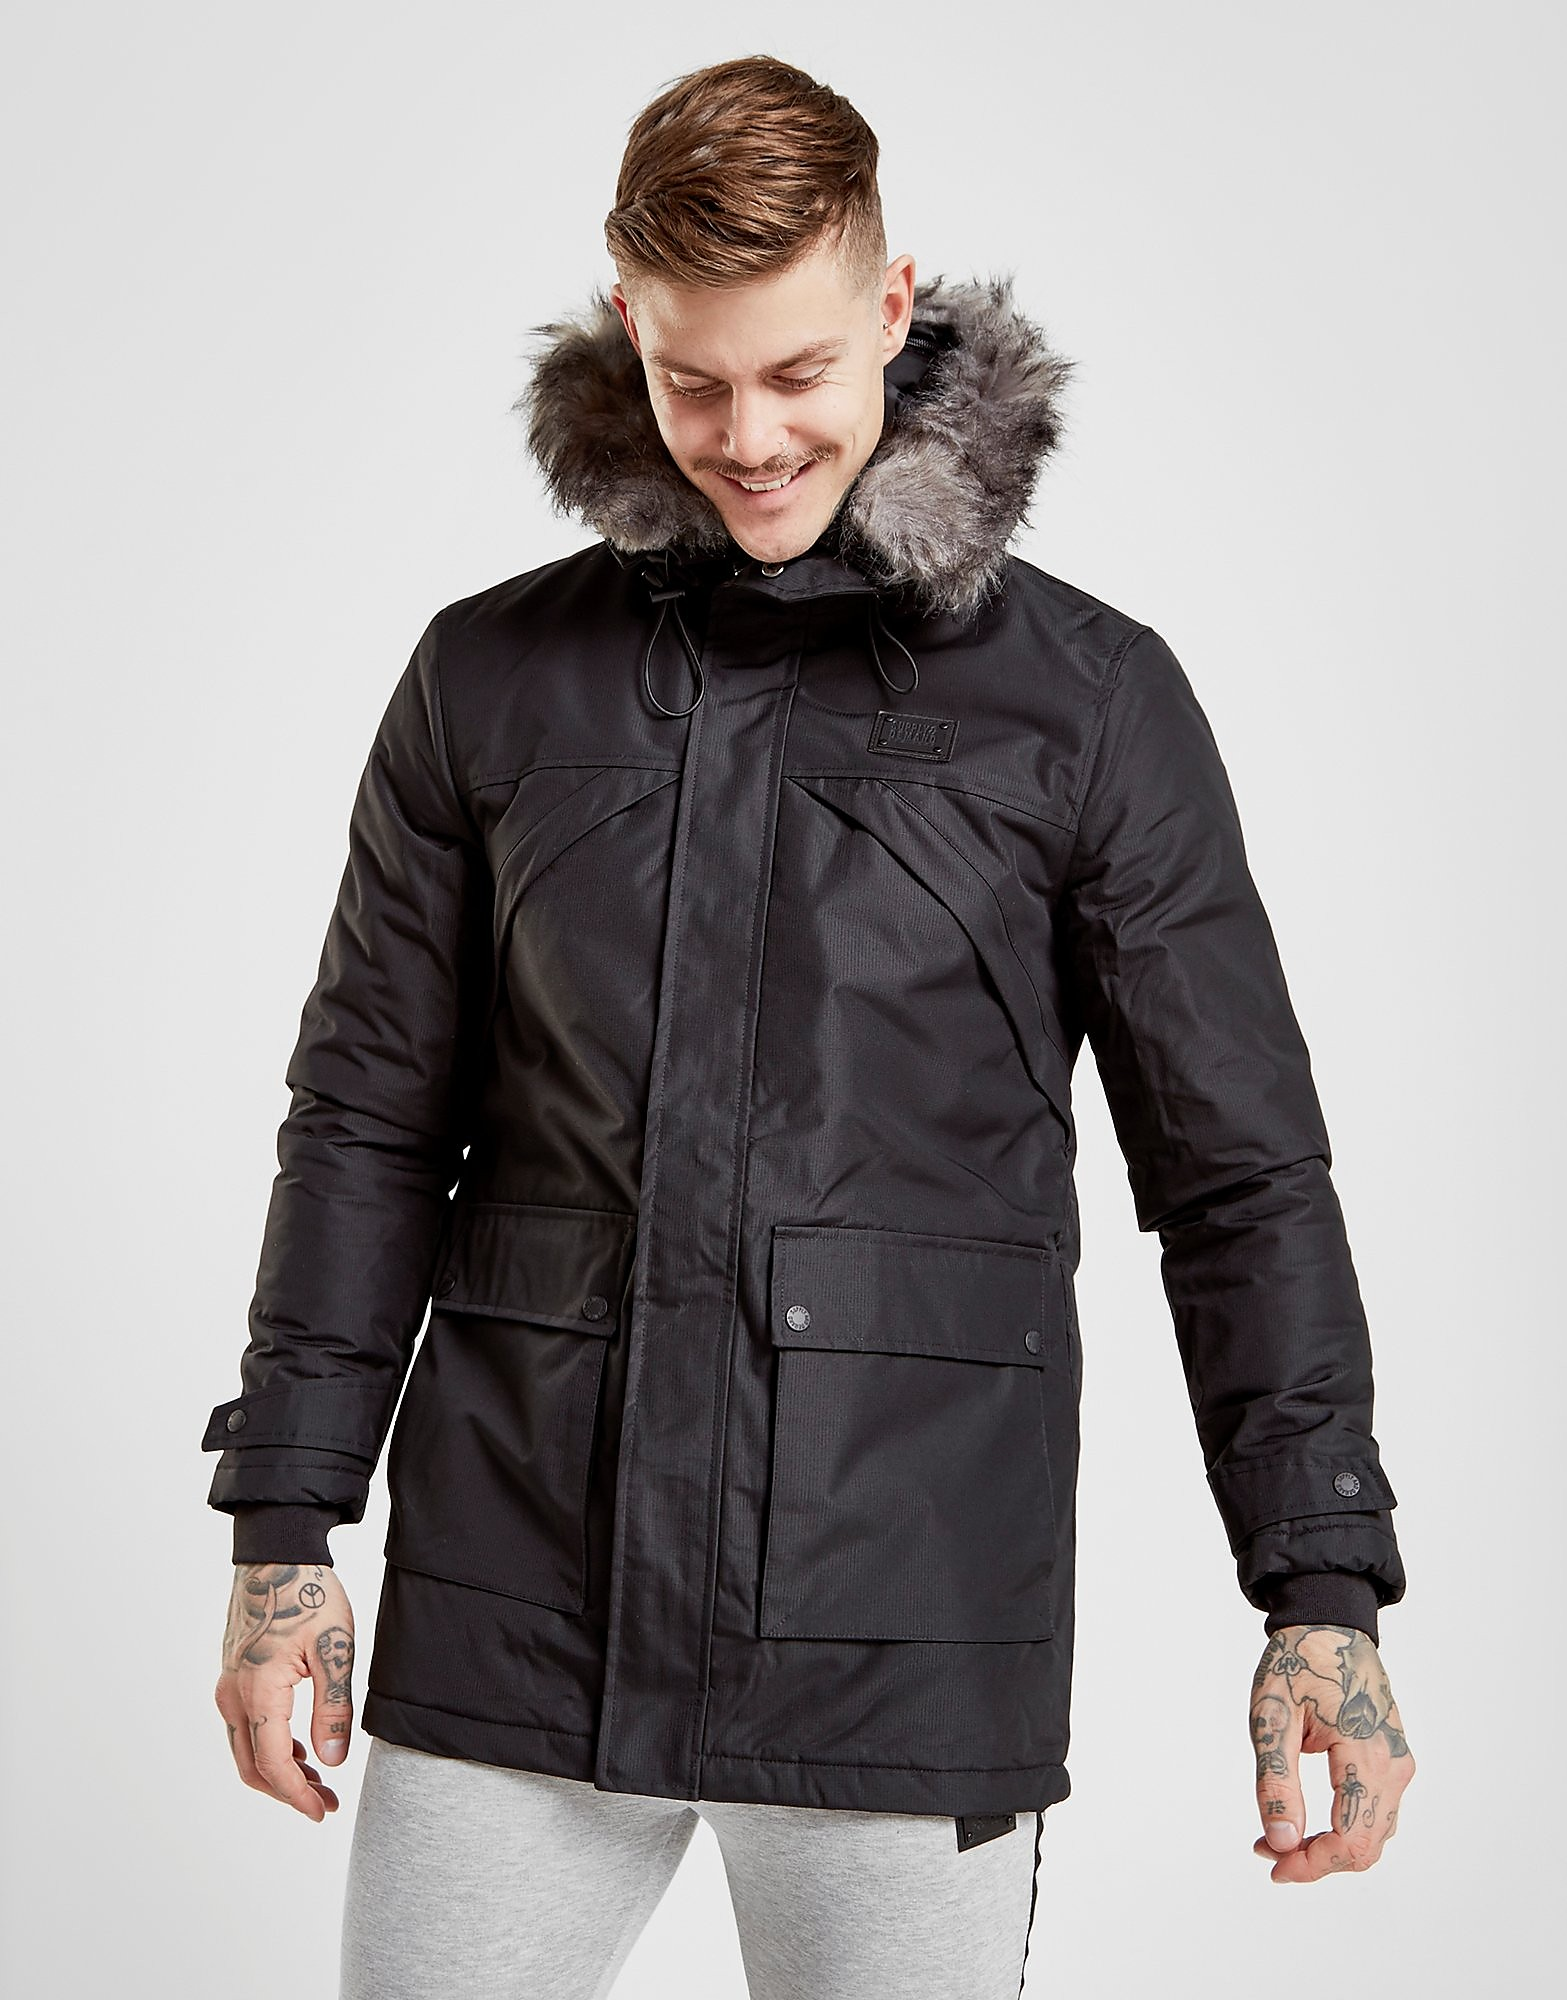 Supply & Demand Stark Parka Jacket Heren - Zwart - Heren